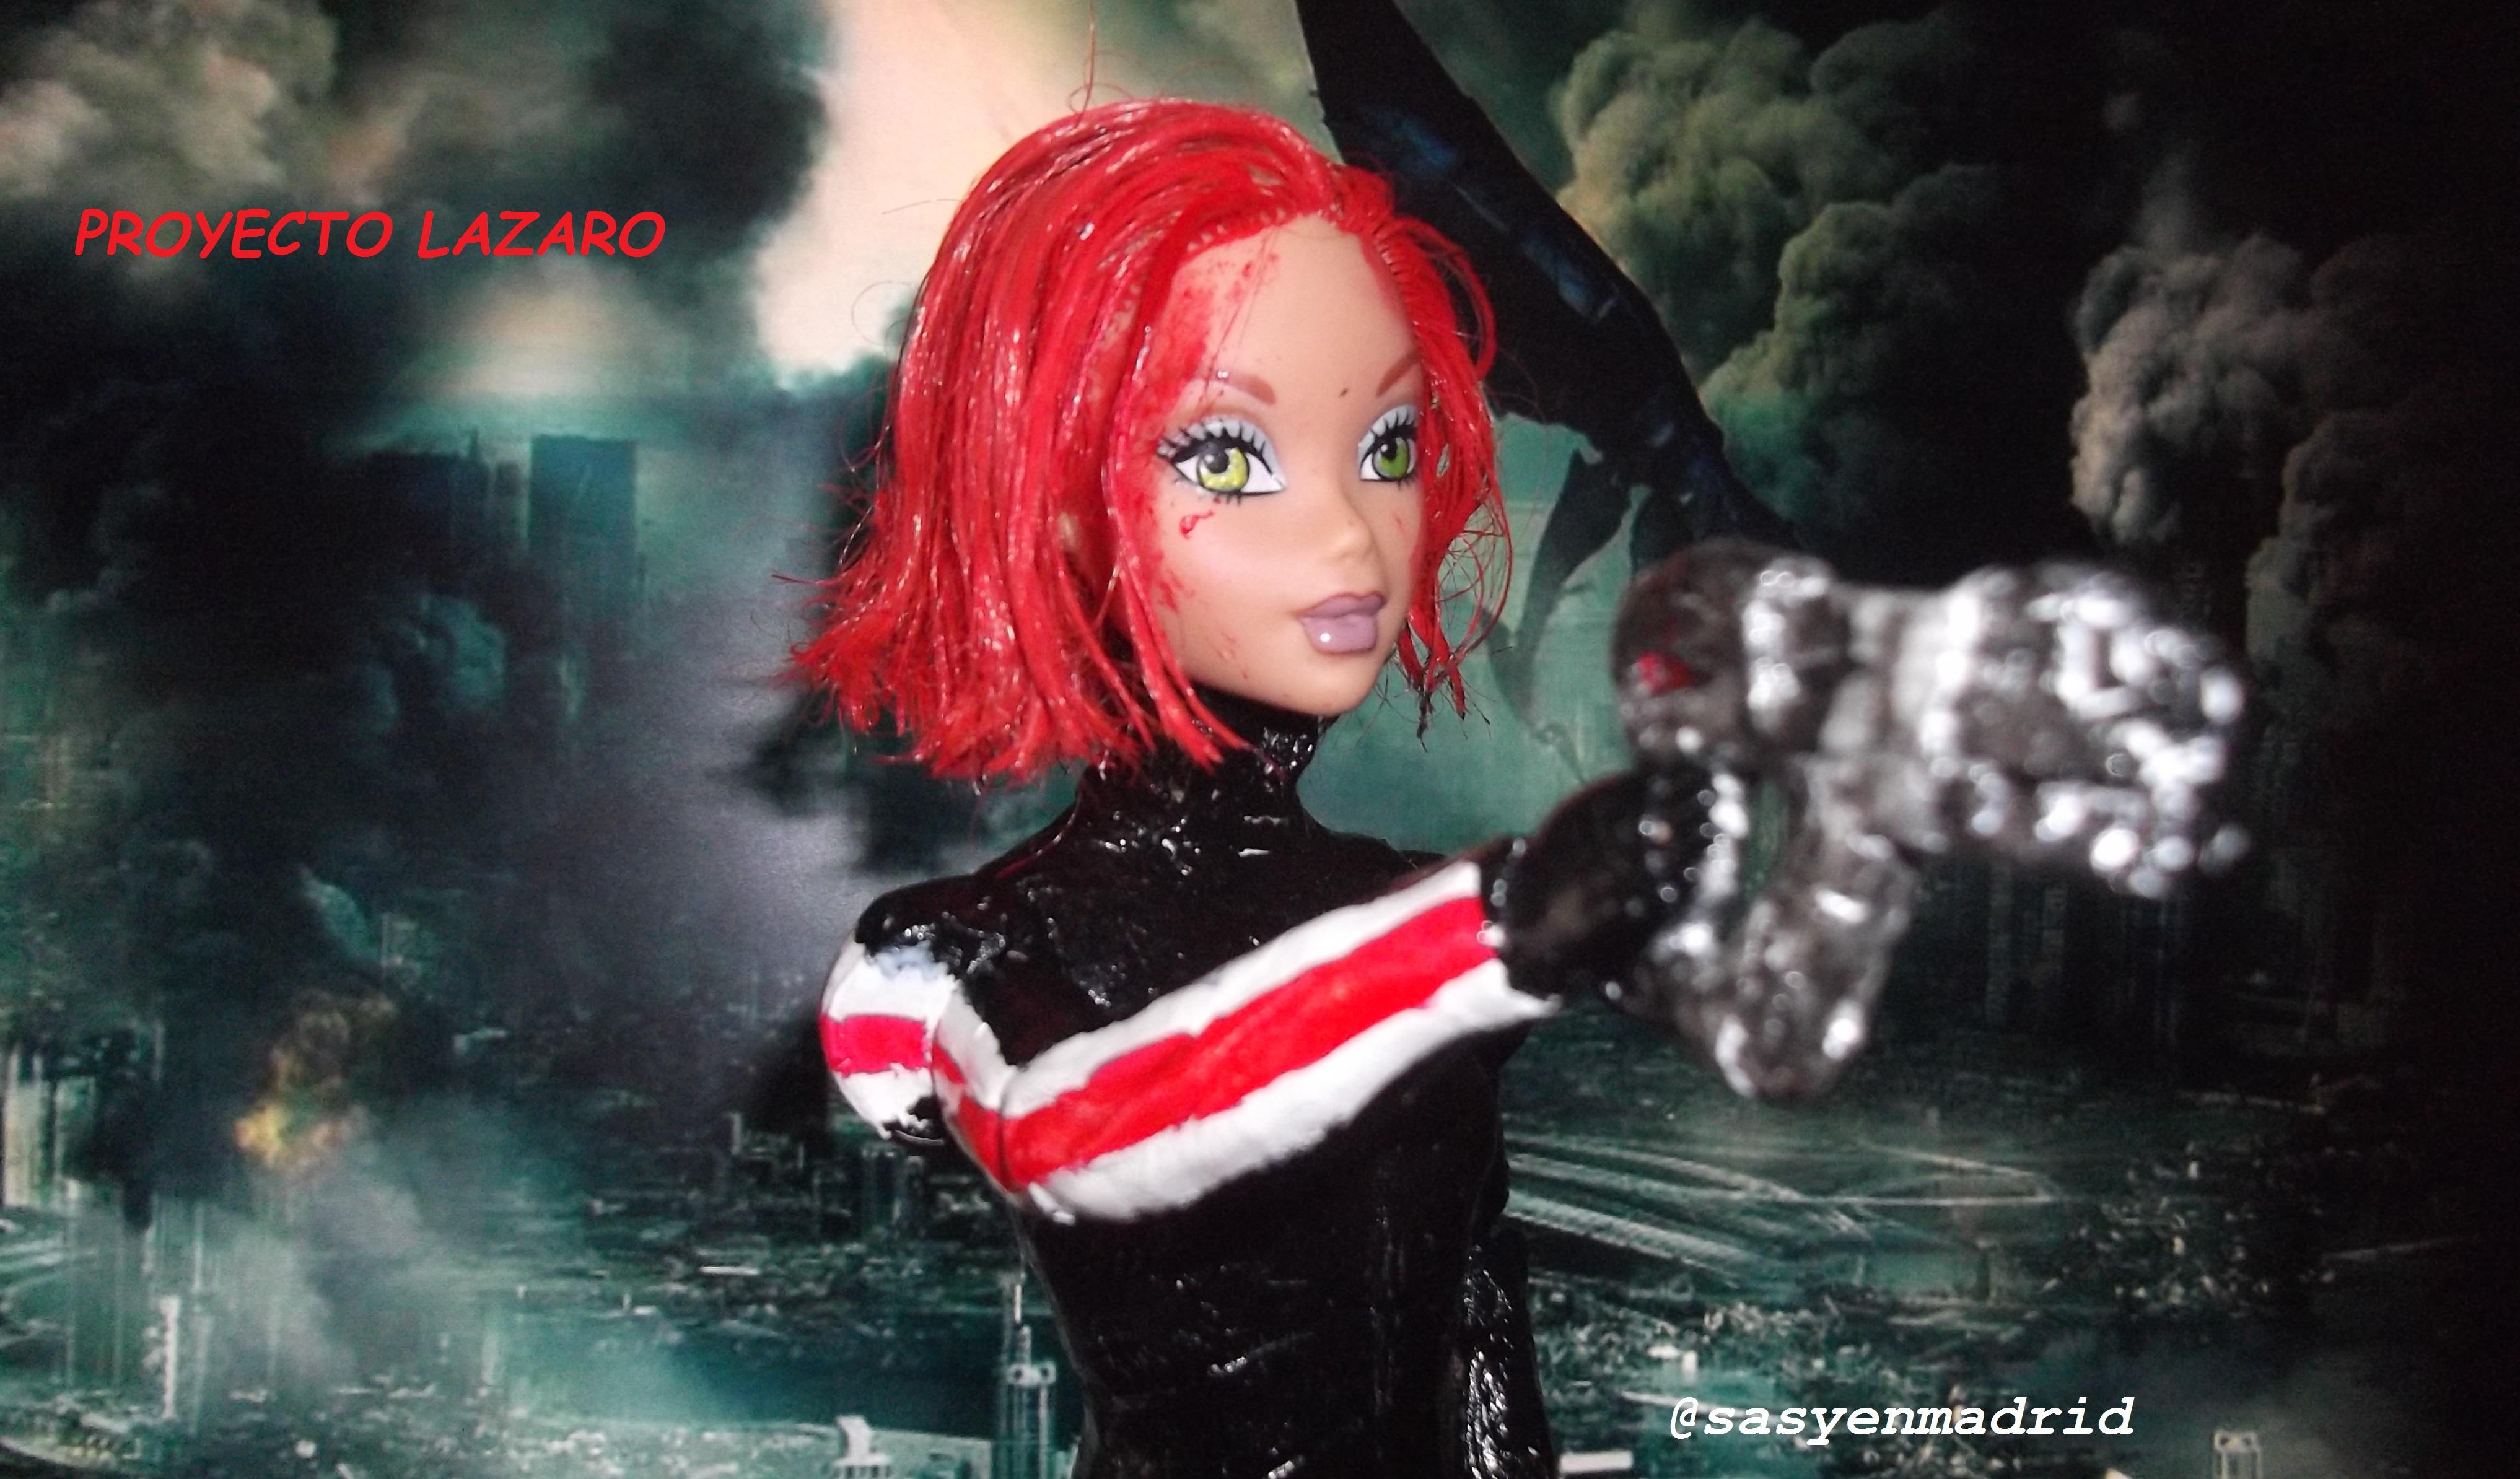 Proyecto Lazaro, mi Comandante Shepard